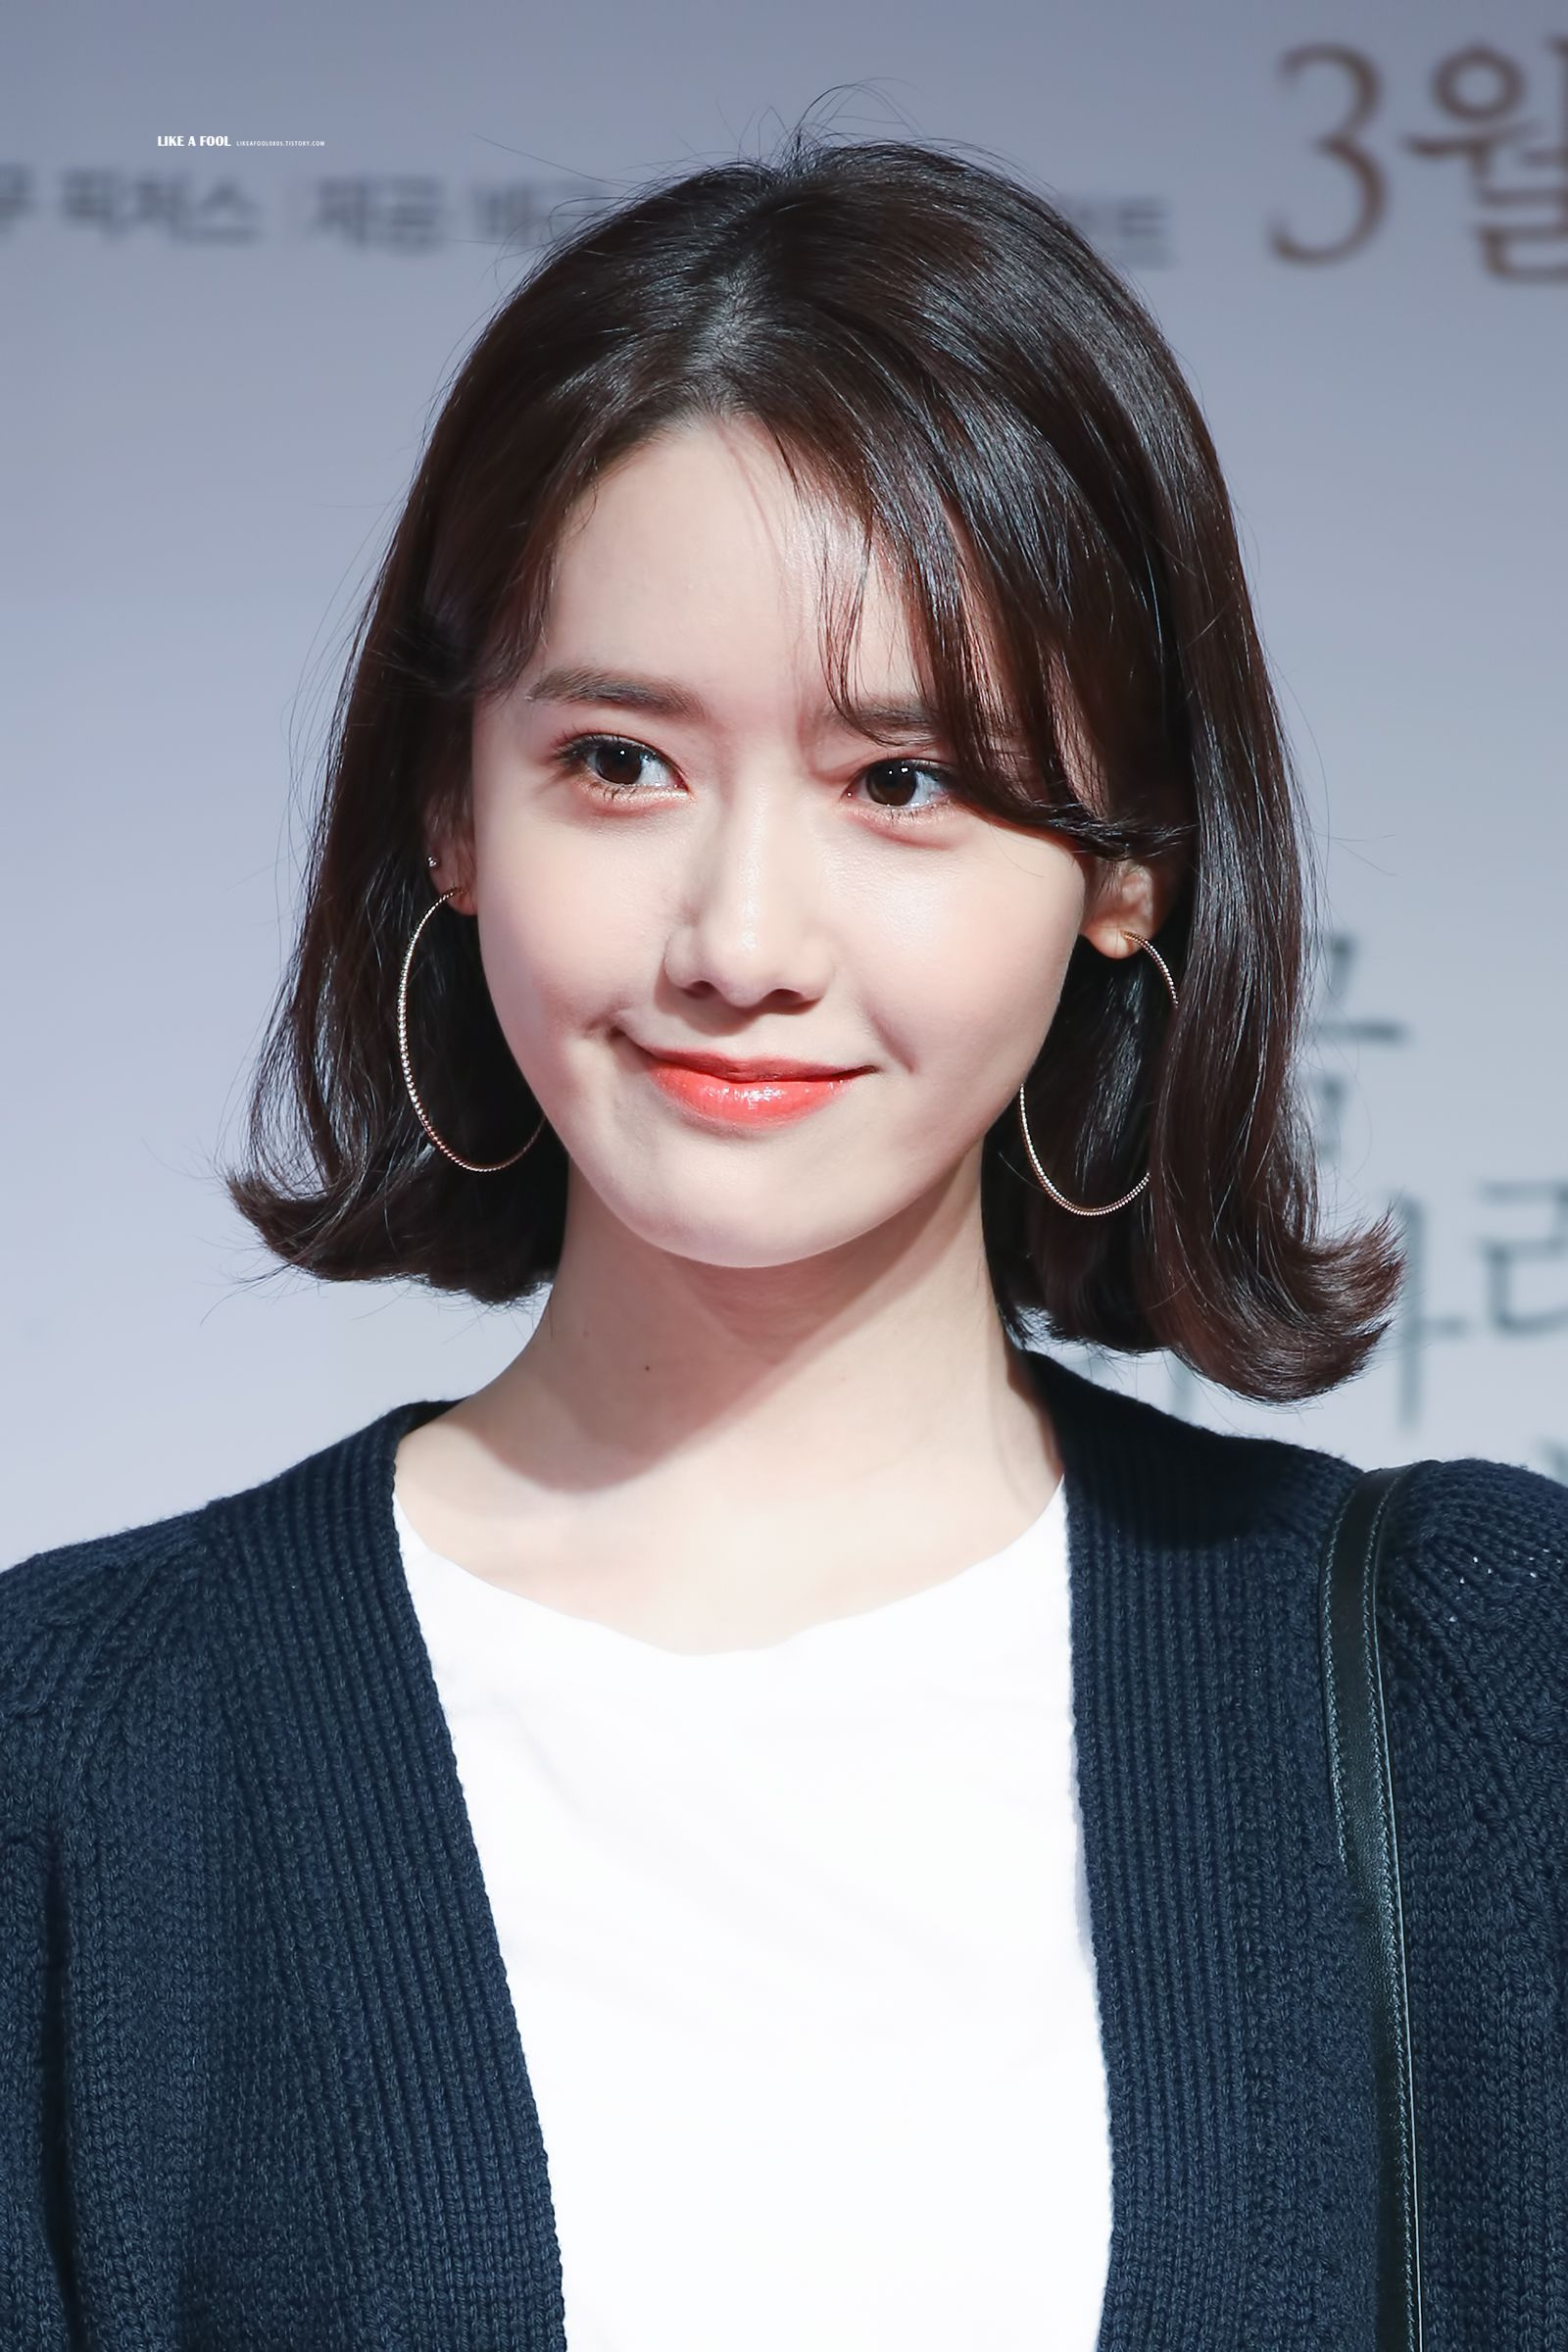 Yoona 180312 Be With You Premiere Manuth Chek S Soshi Site Medium Hair Styles Short Hair Styles Hair Styles